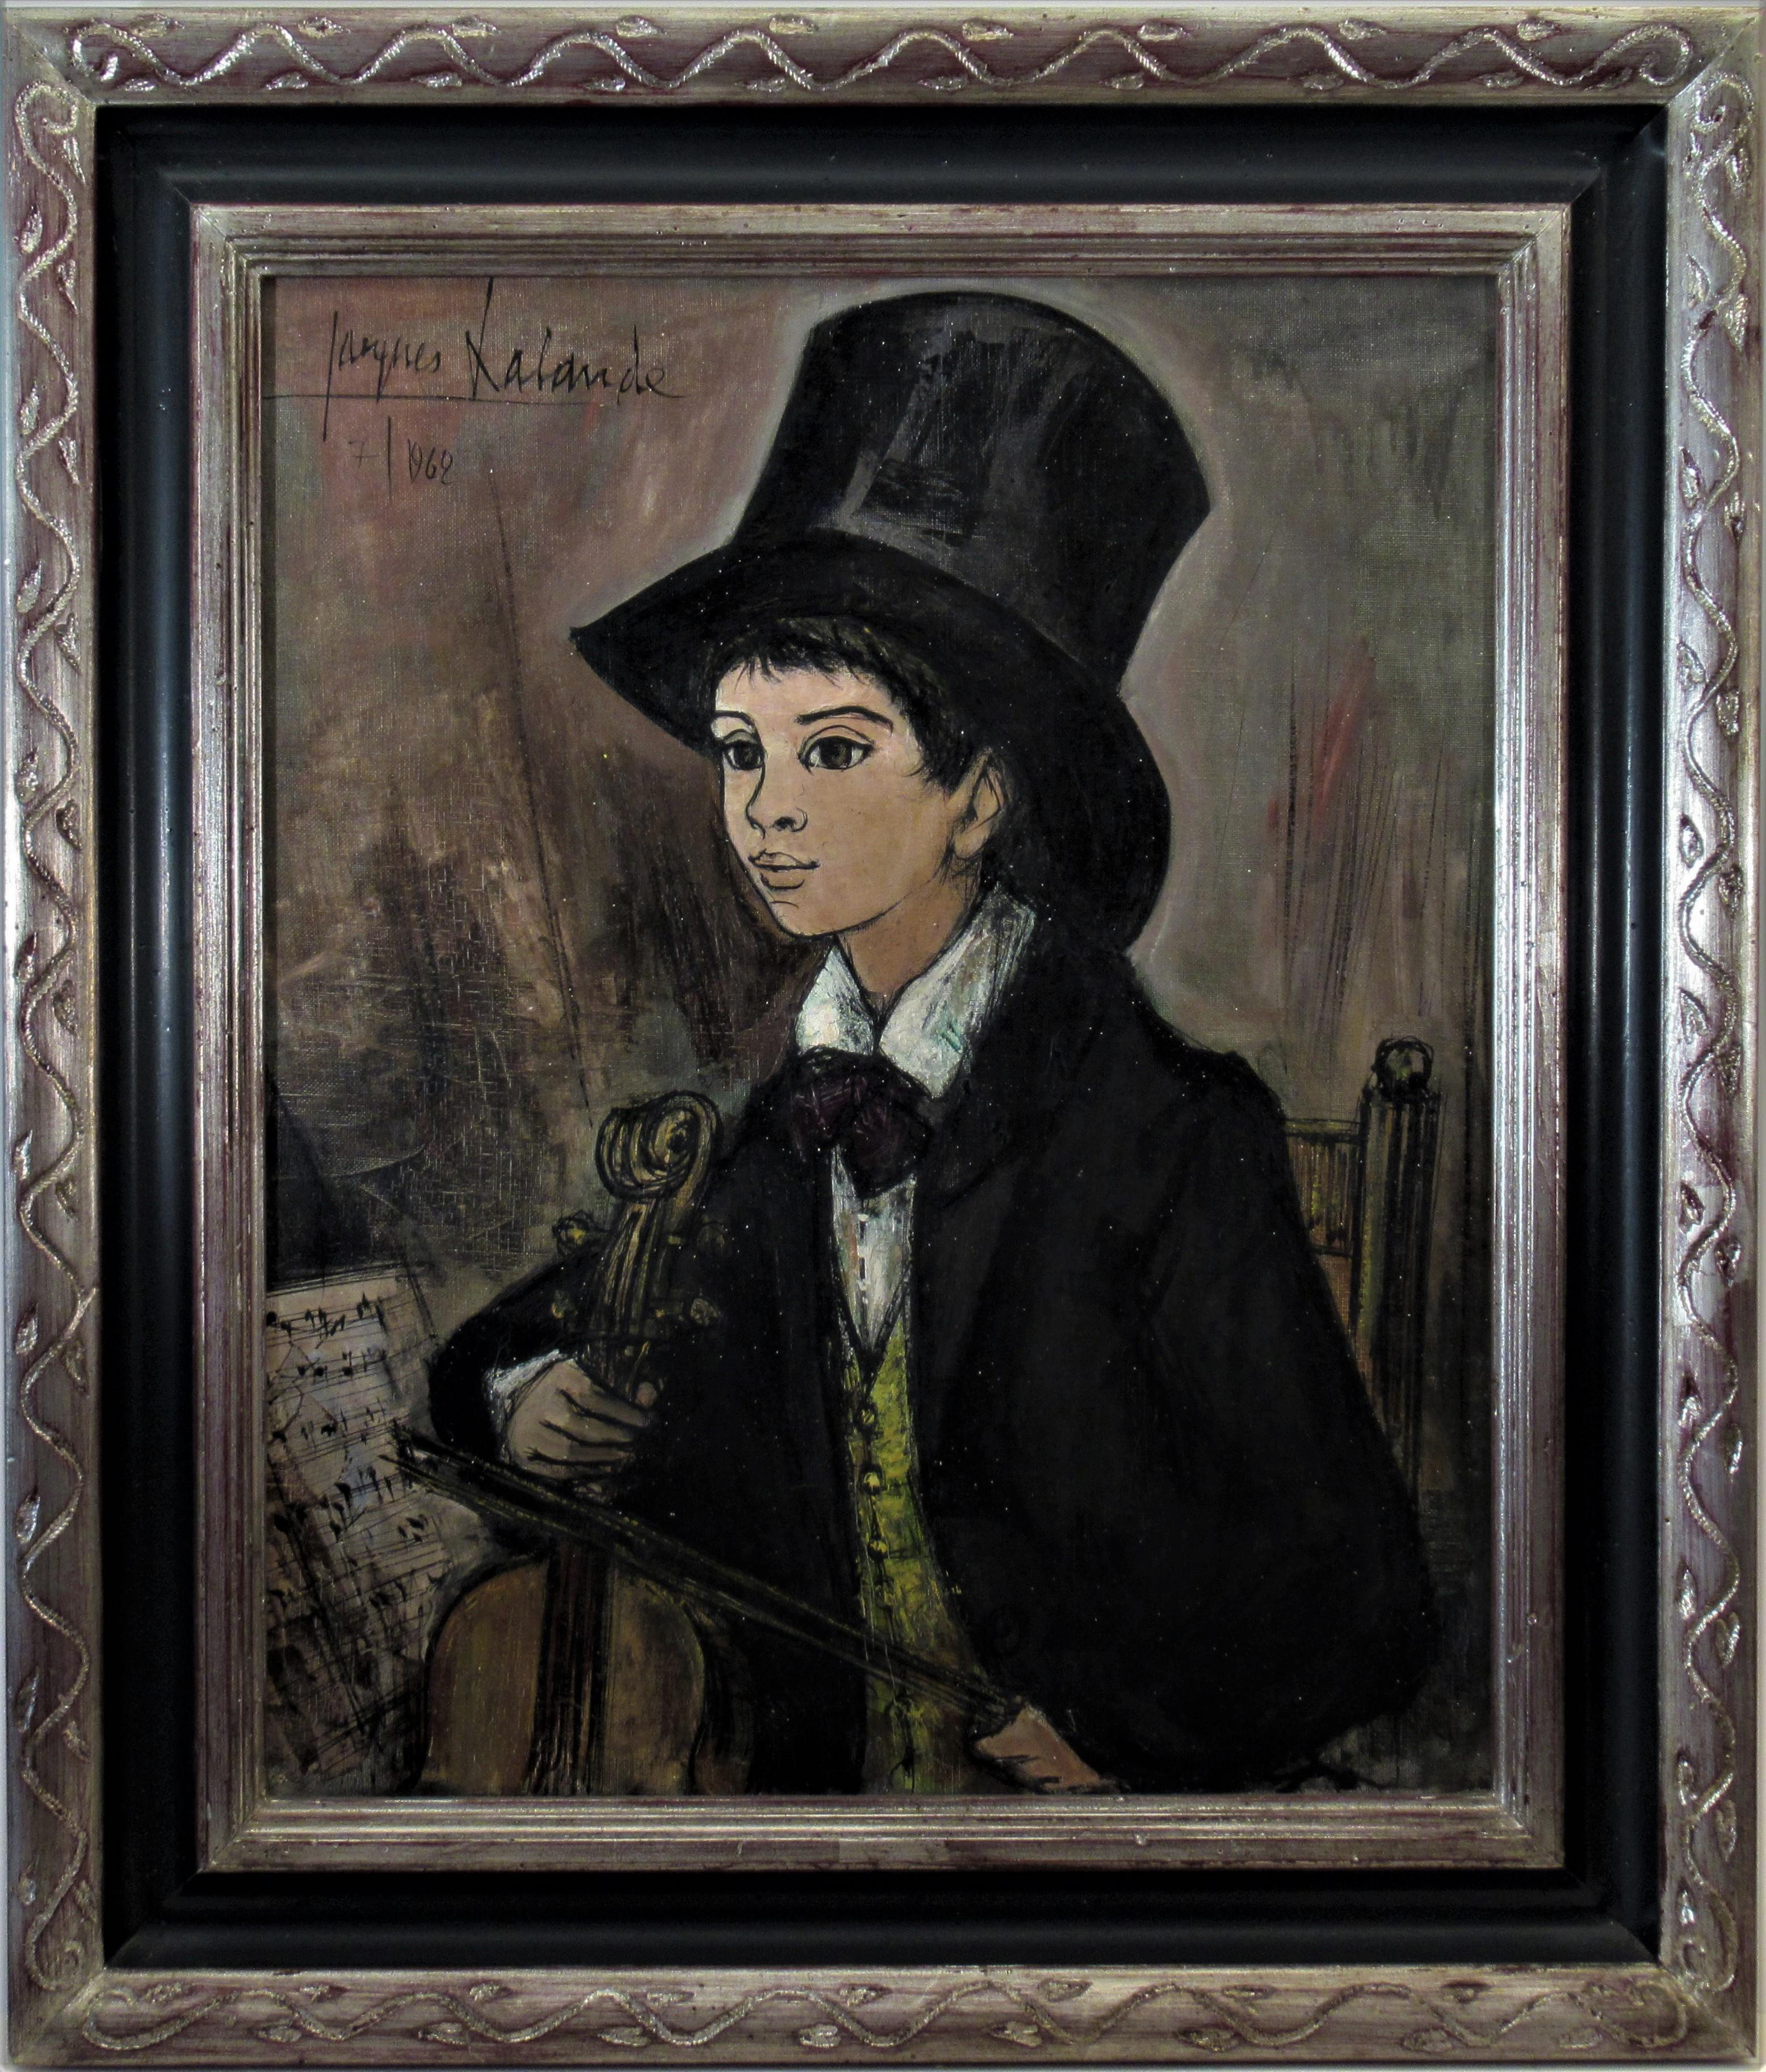 Le Jeune Violoniste (The Young Violinist)